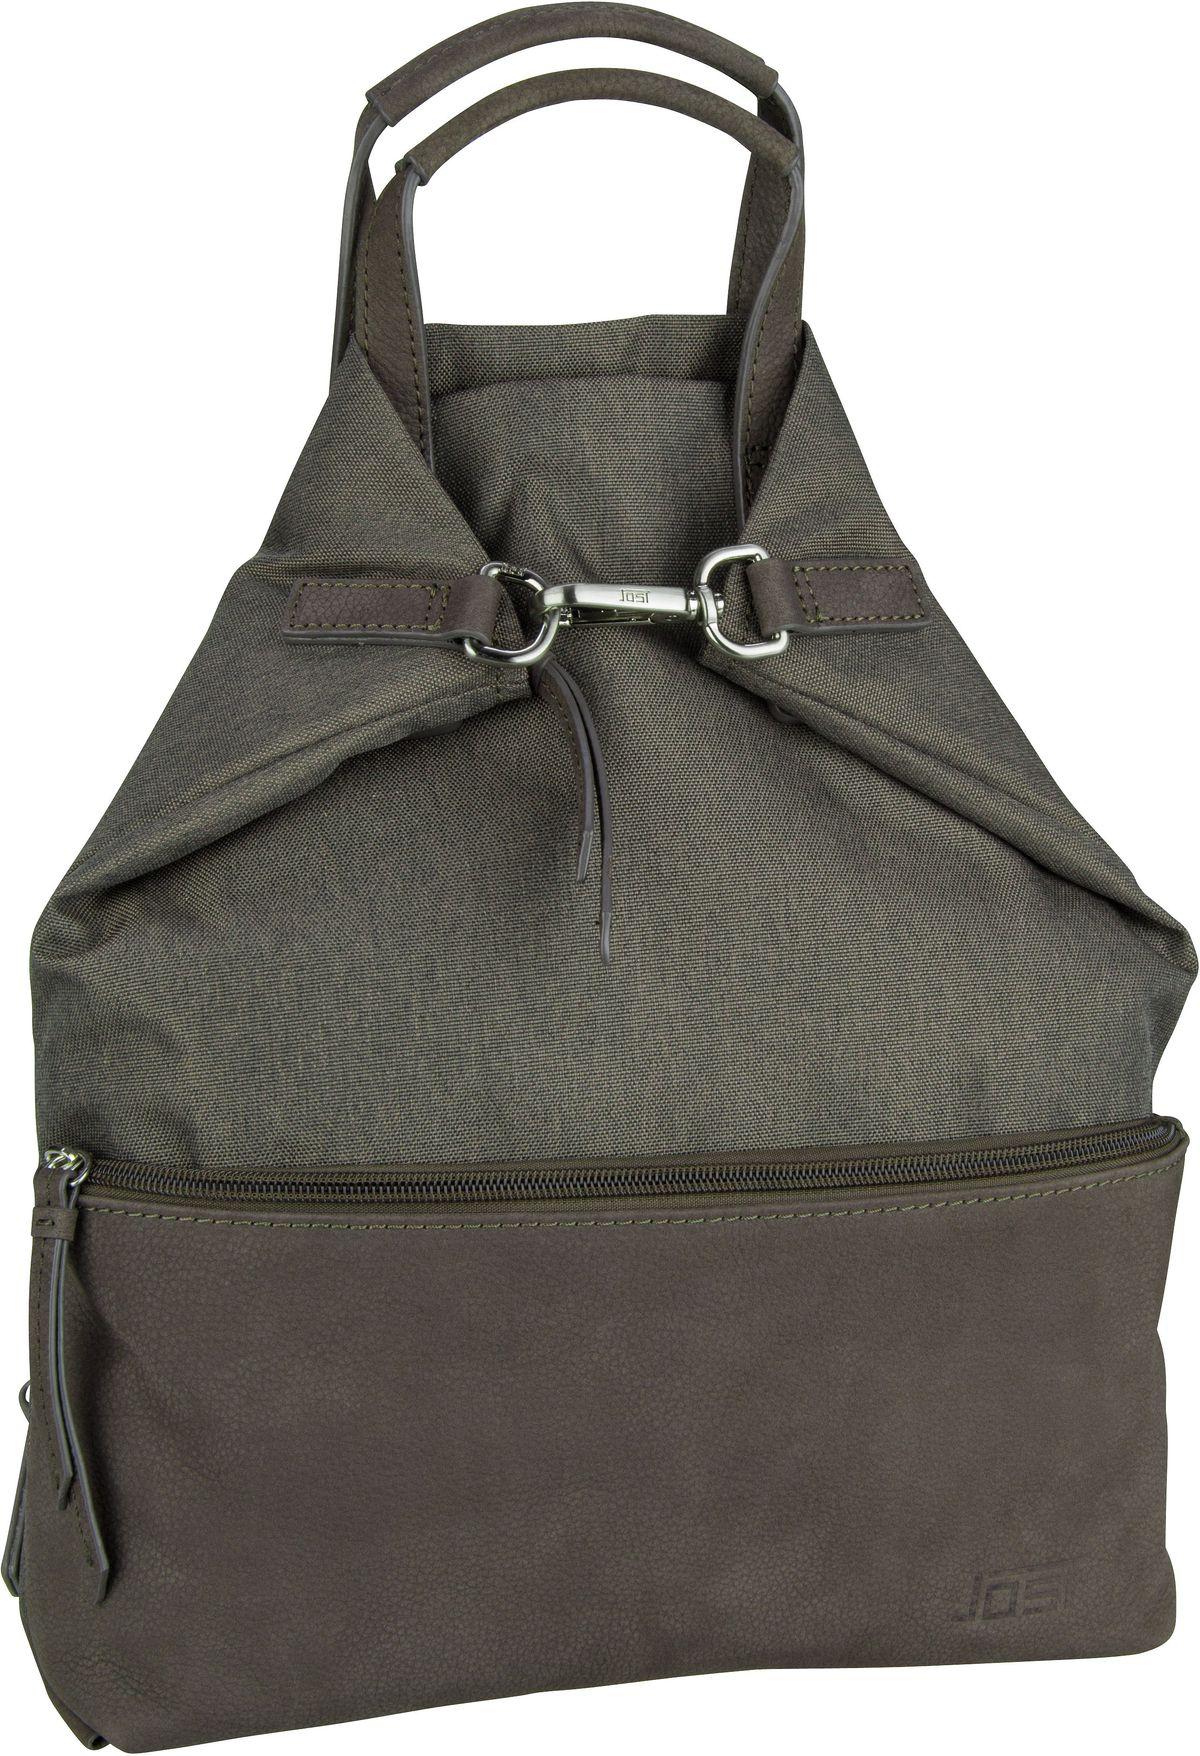 Jost Rucksack / Daypack 2716 X-Change Bag XS Taupe